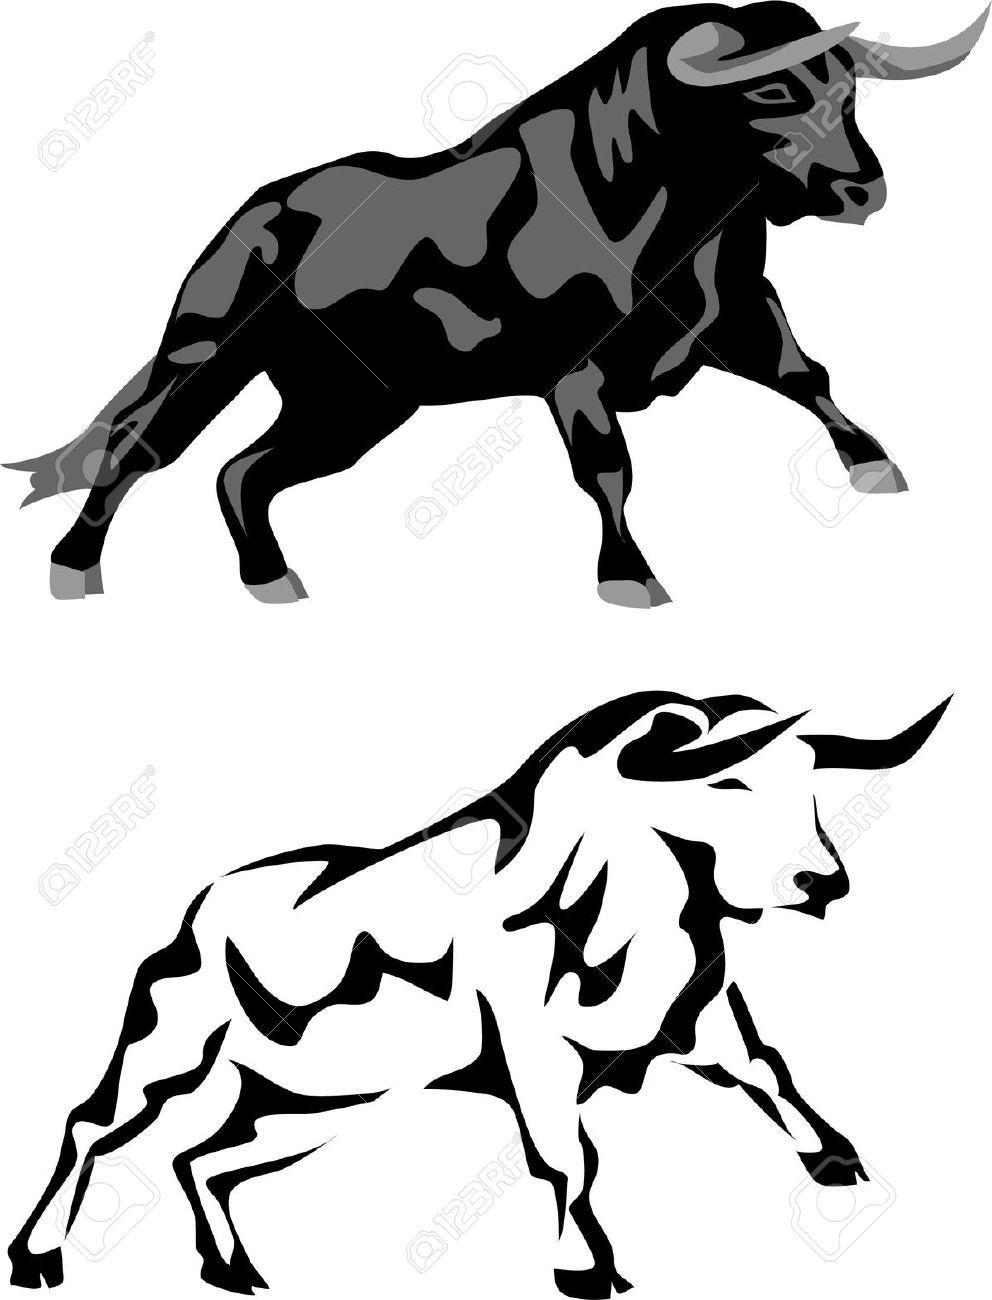 Dibujos De Toros Reparo Wwwimagenesmycom